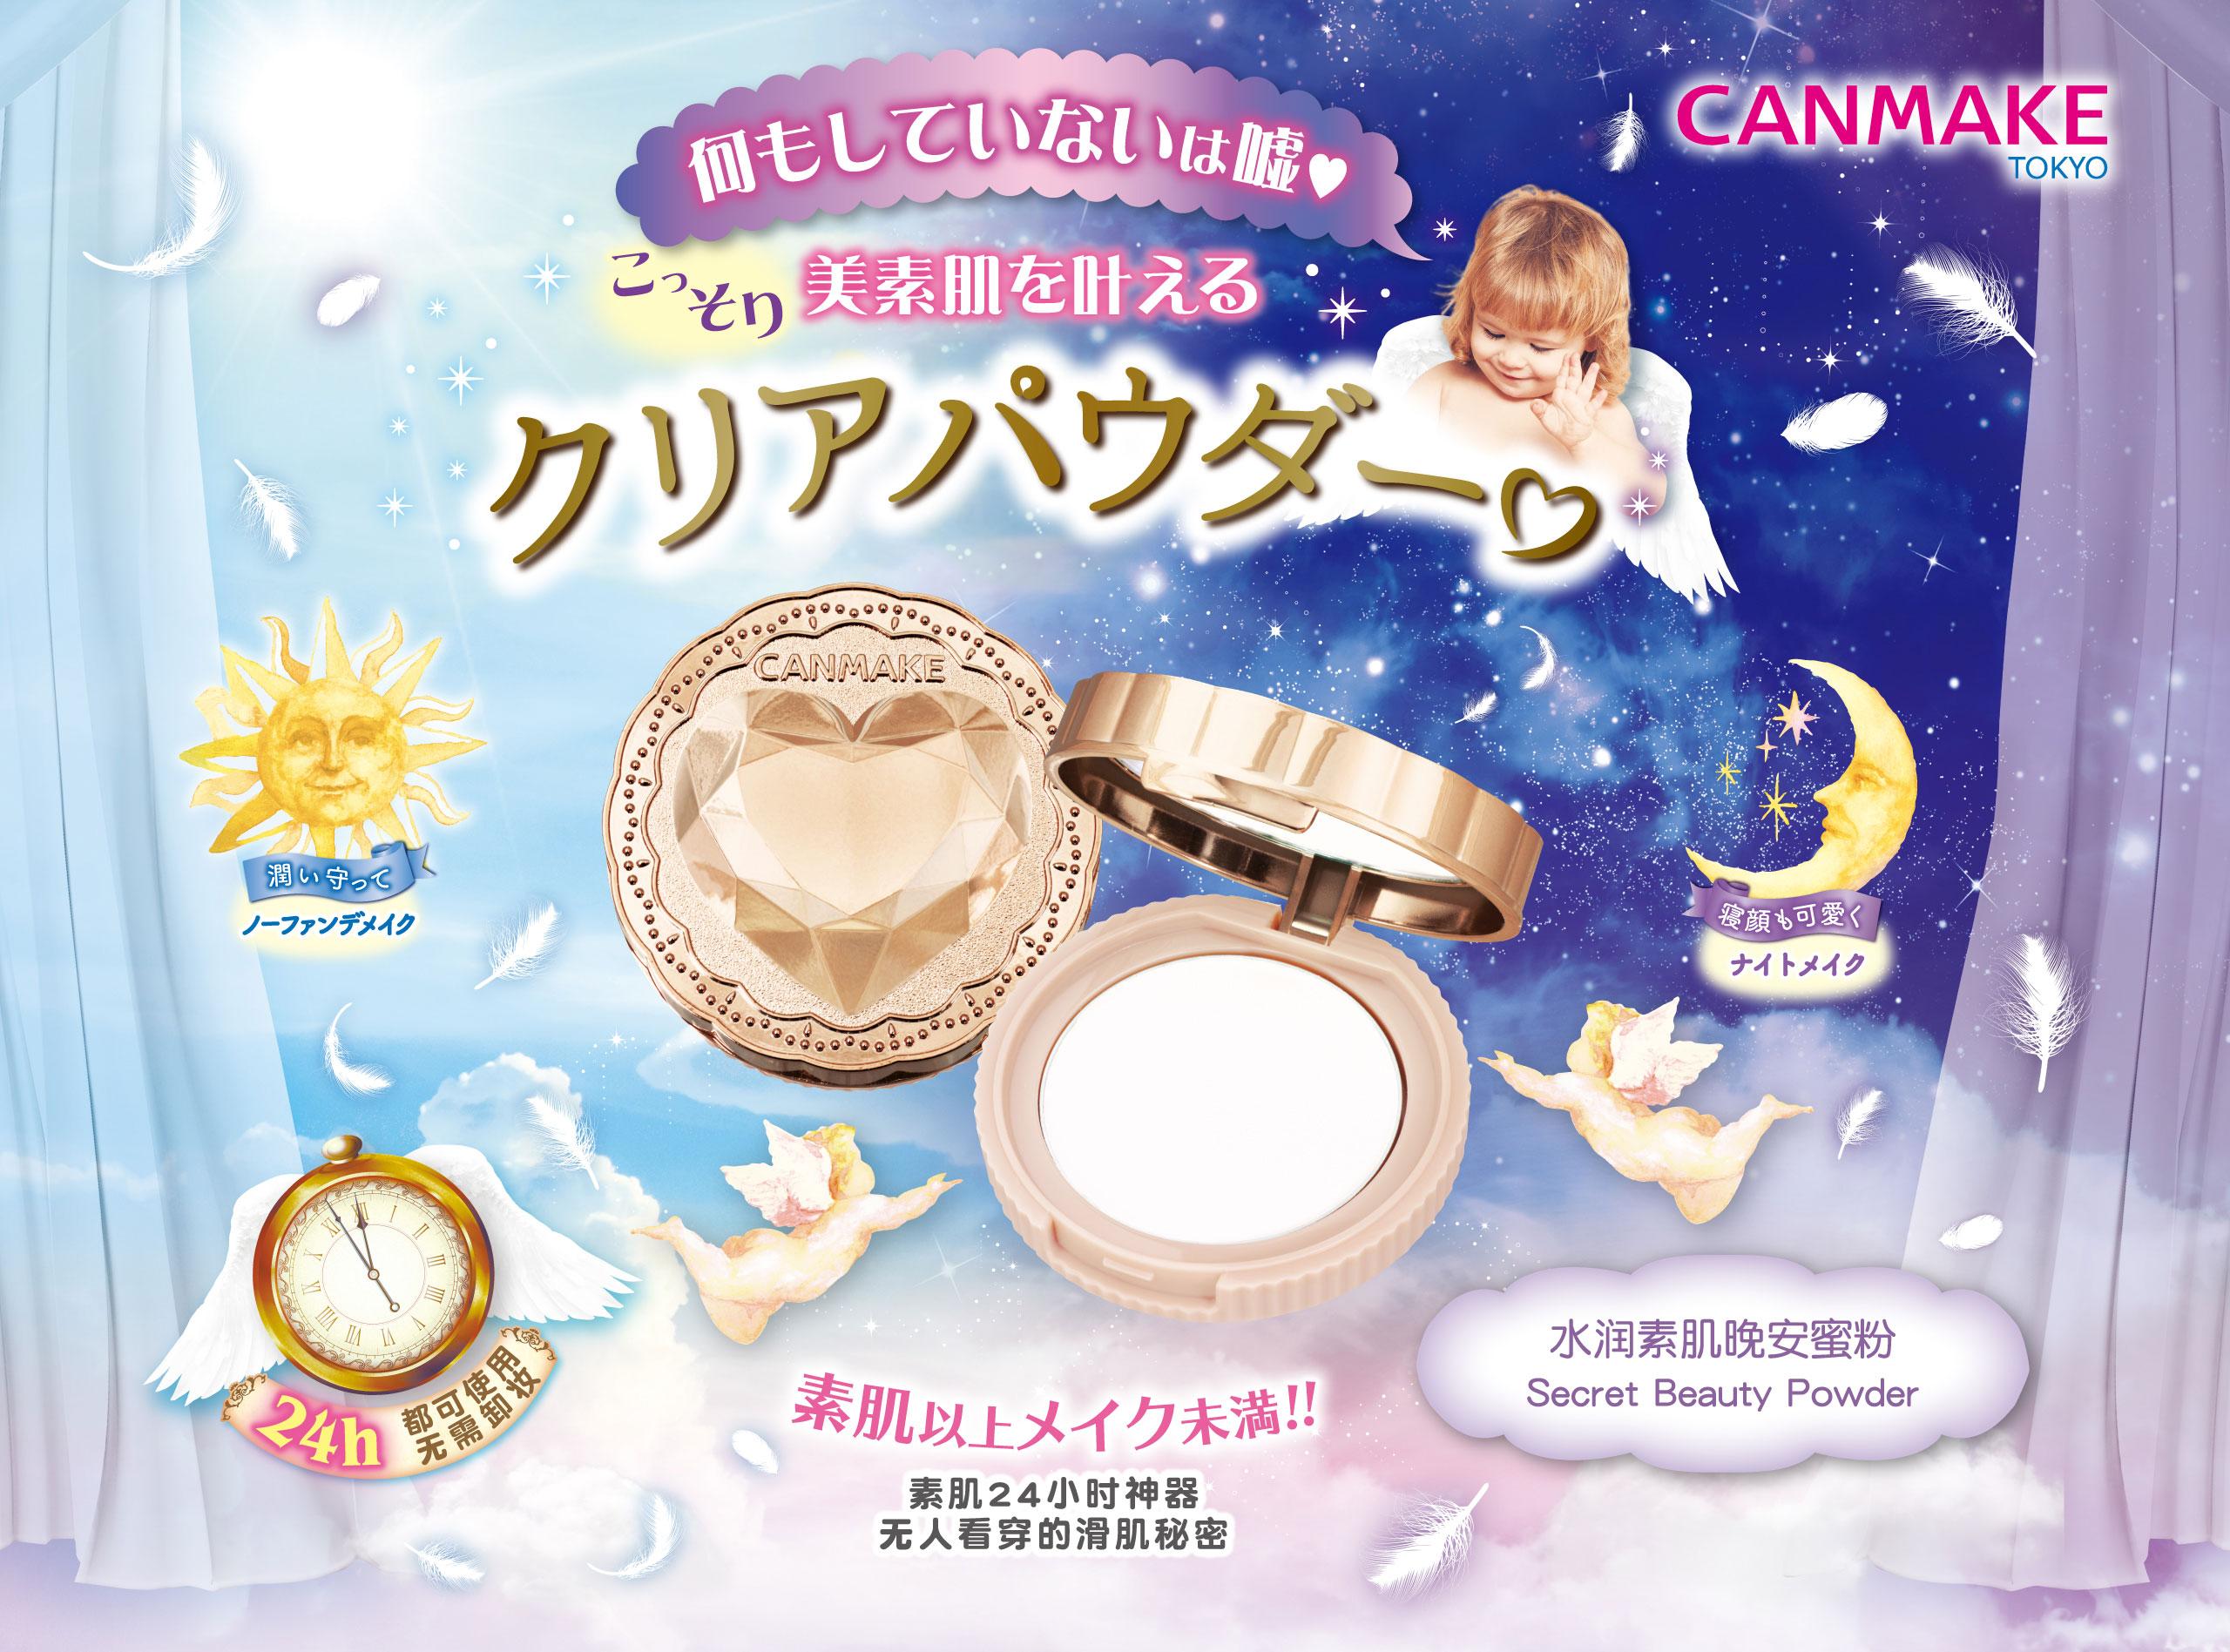 Secret Beauty Powder 水润素肌晚安蜜粉隆重登场!